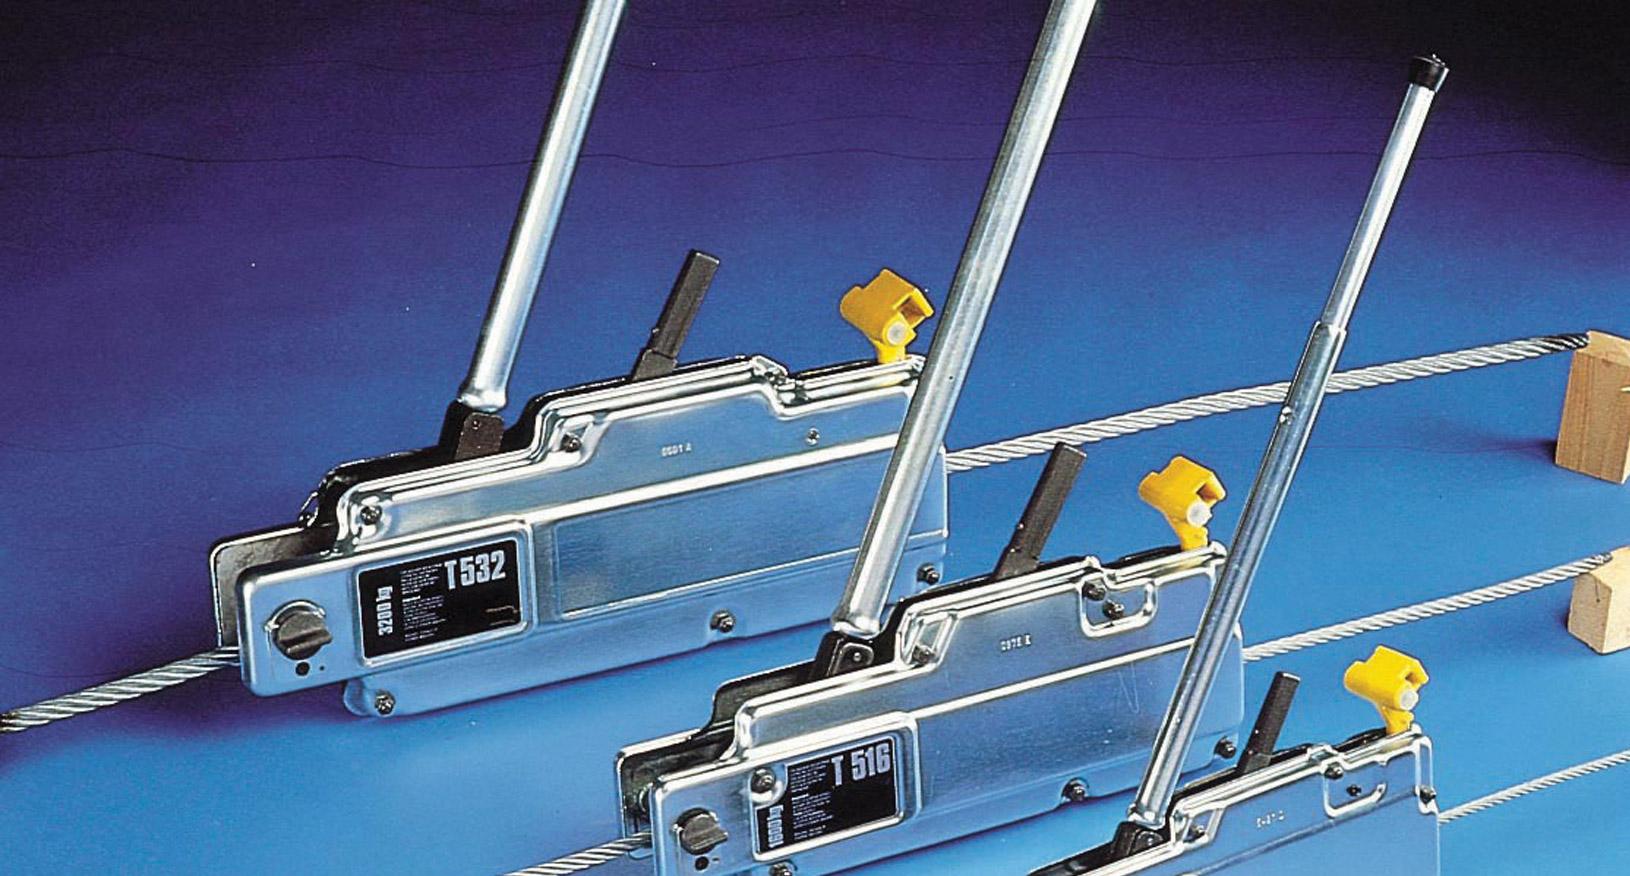 1.6T Lift/Pulling Machine